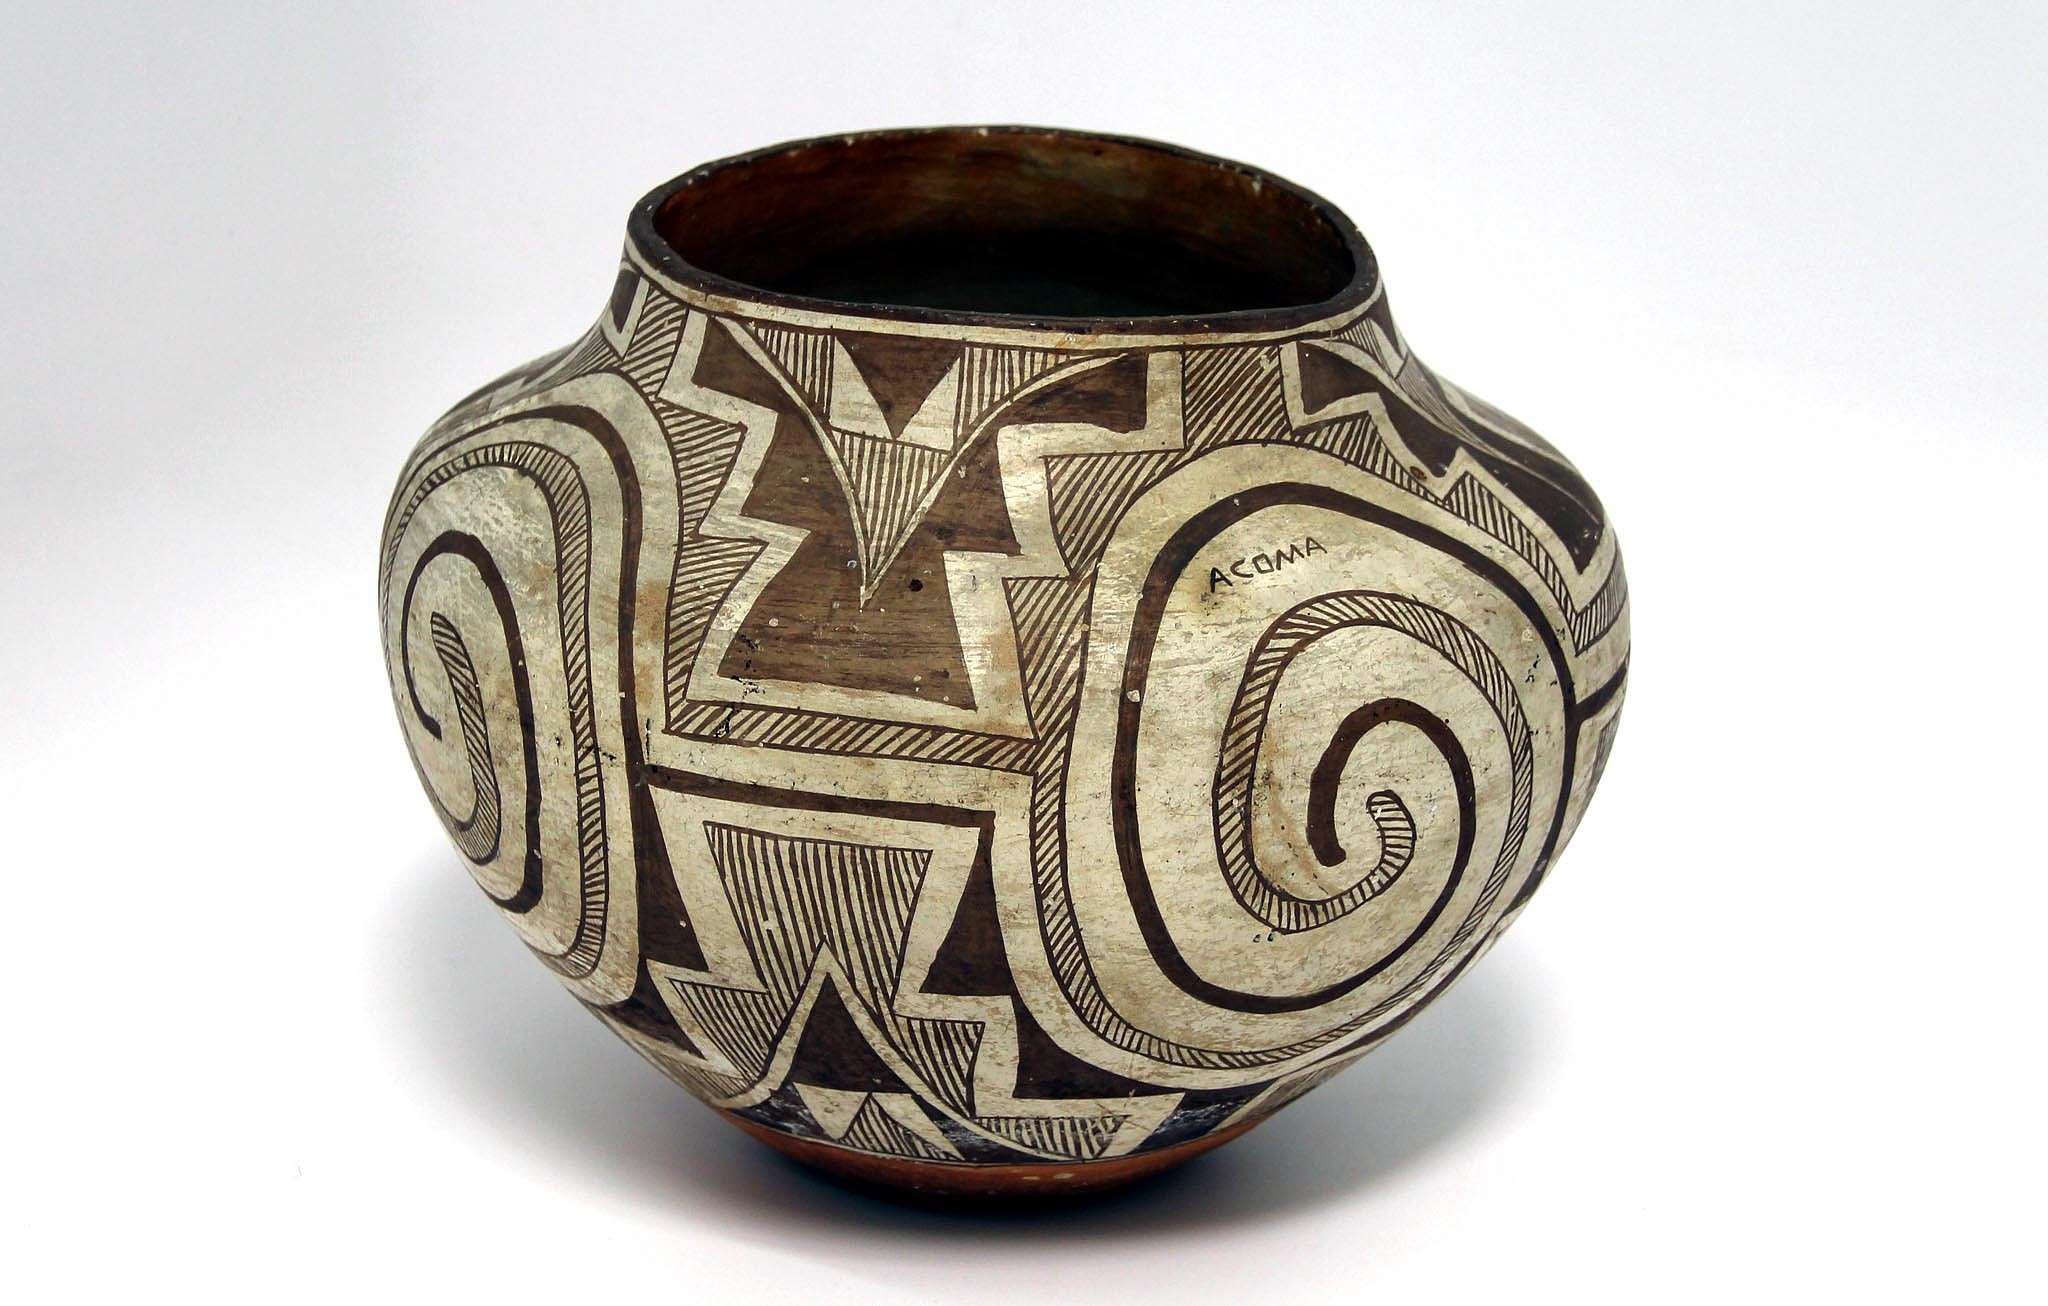 November 23, 2018 - New Acquisitions o Antique Pottery | Len